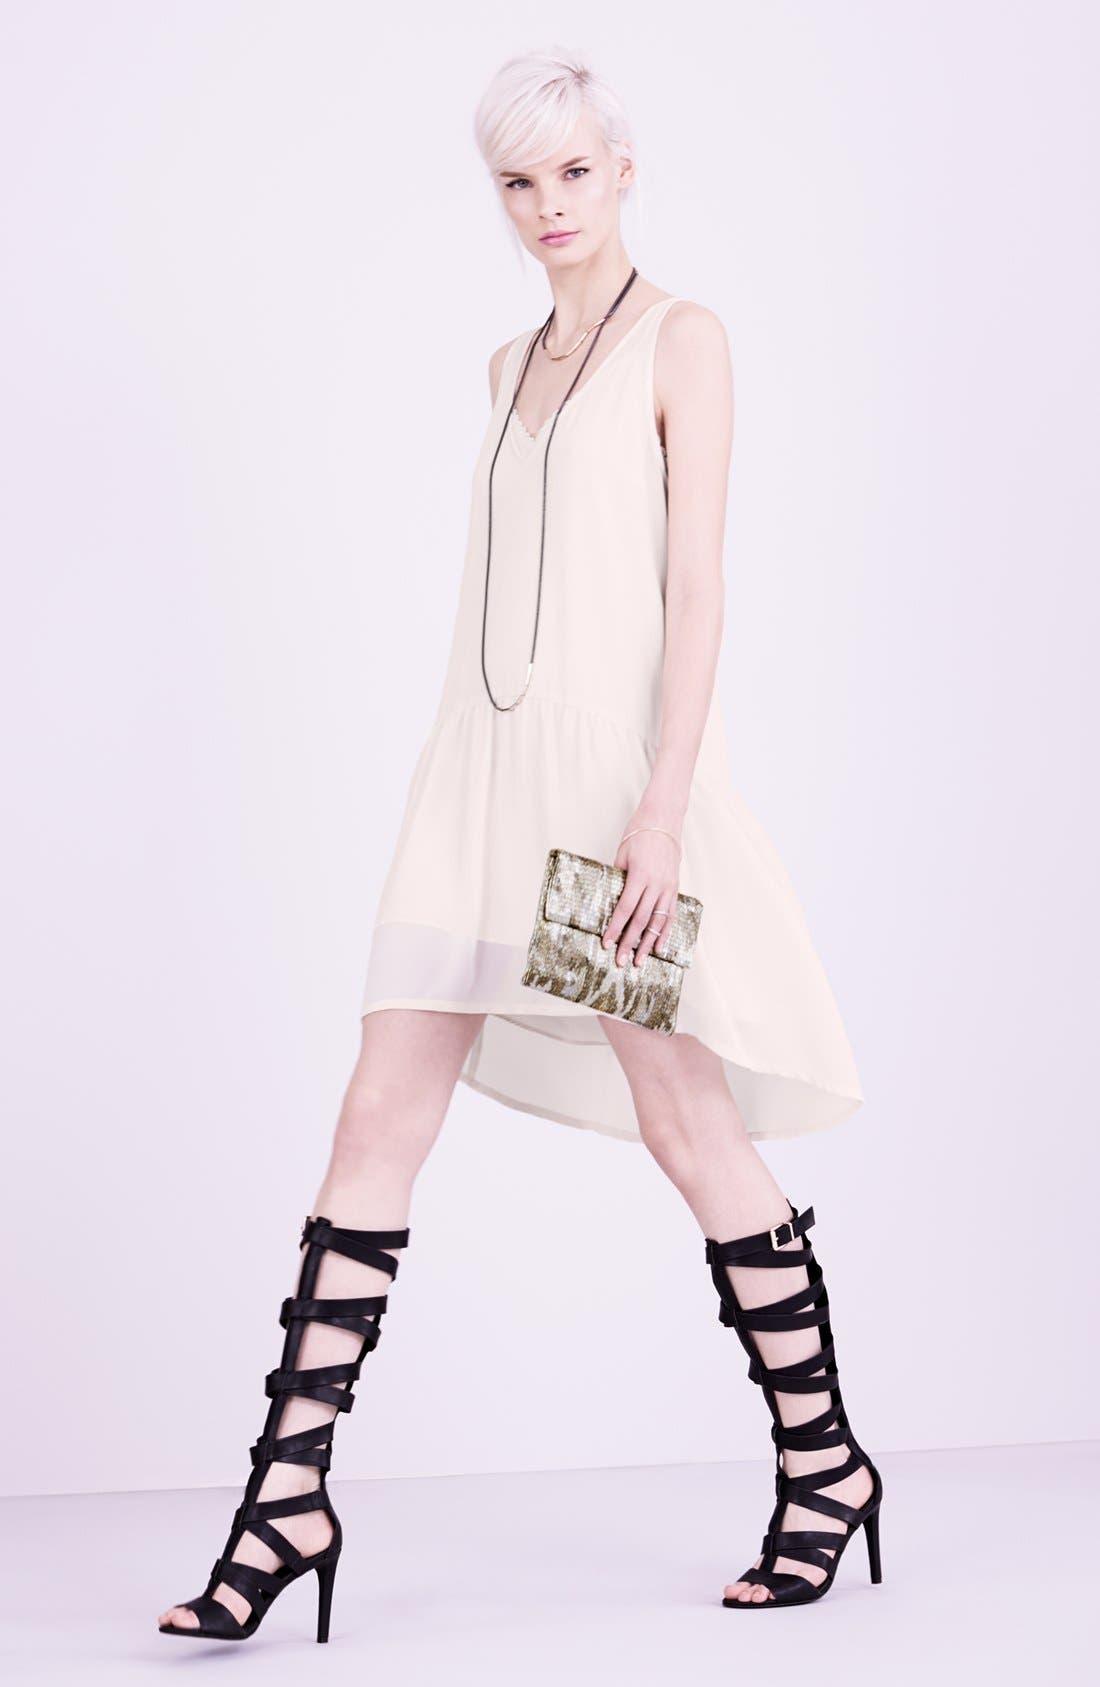 Main Image - Tildon High/Low Dress & Accessories